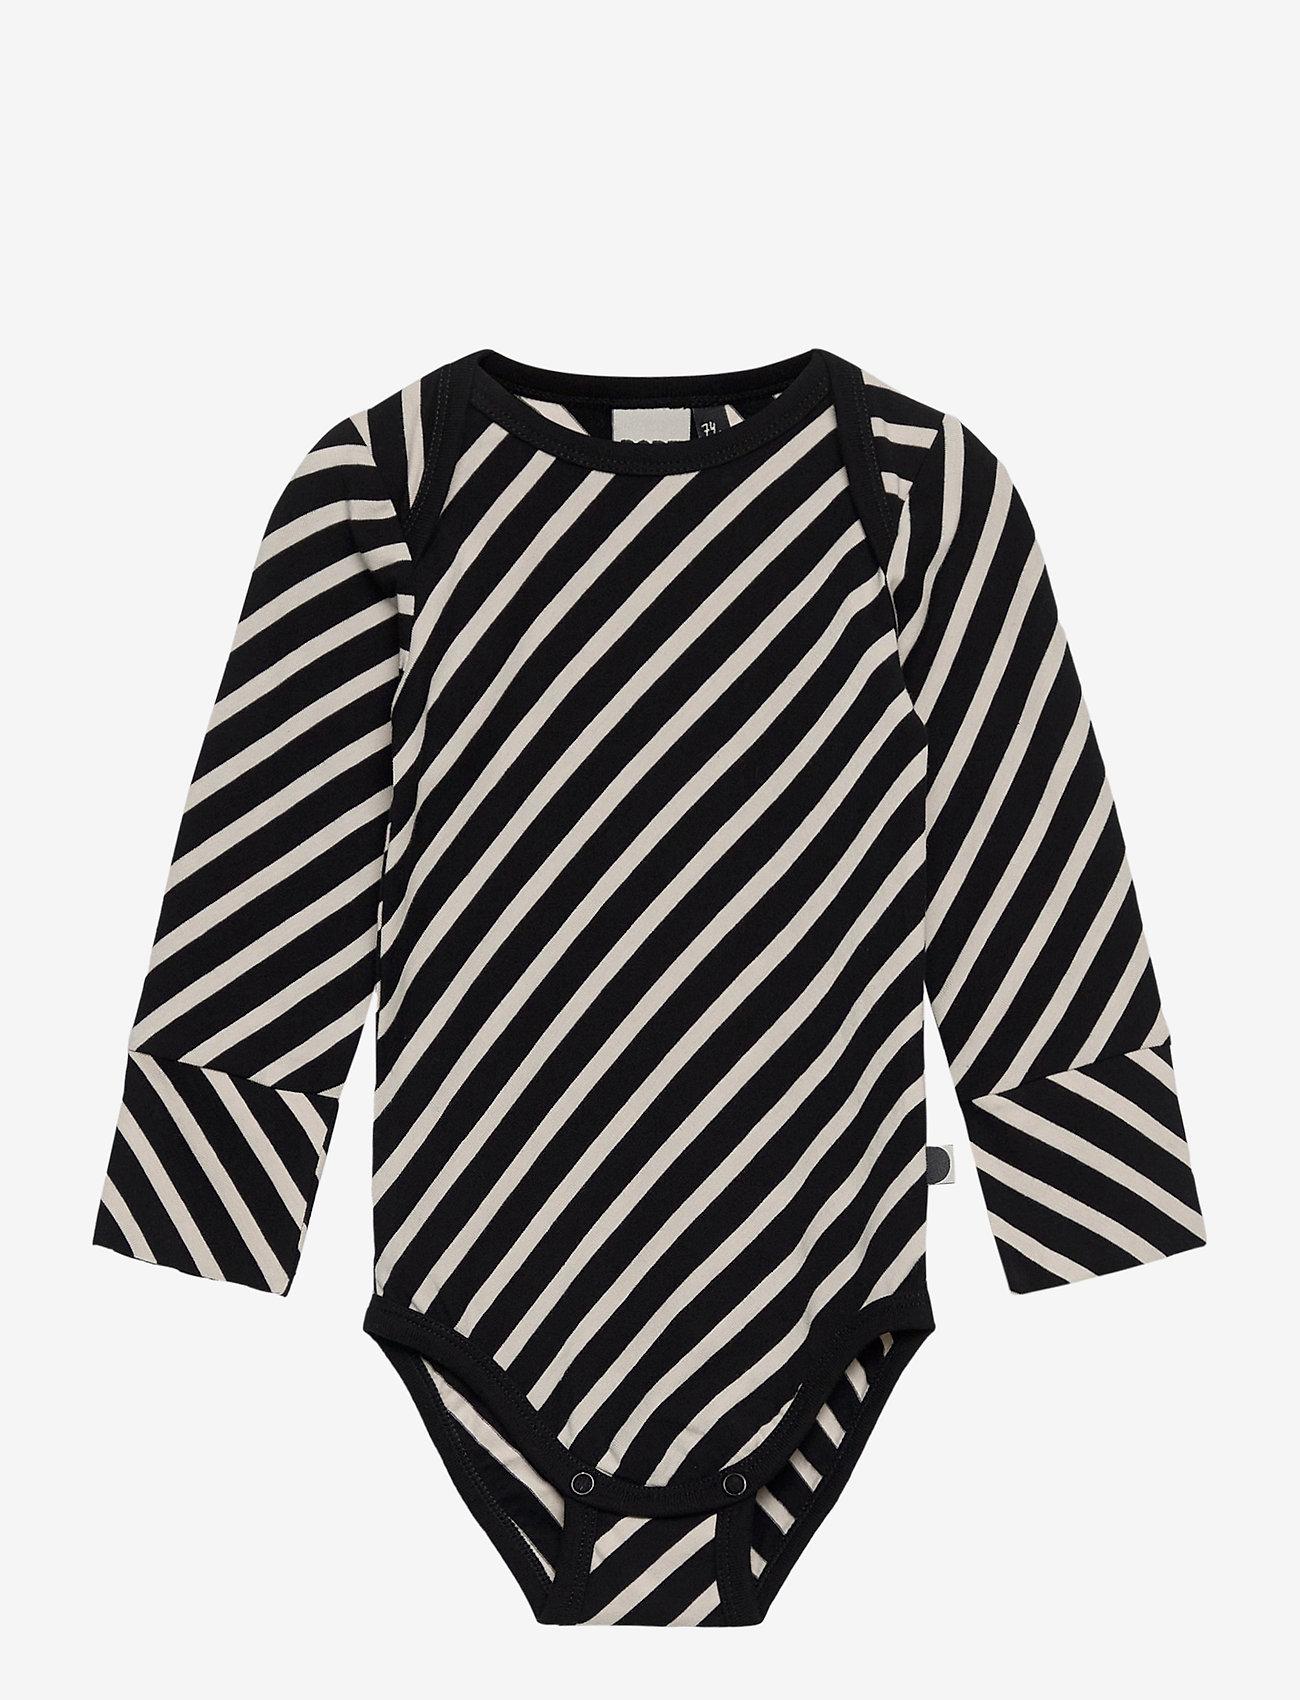 Papu - STRIPE BODY BABY - langärmelig - black, sand - 0